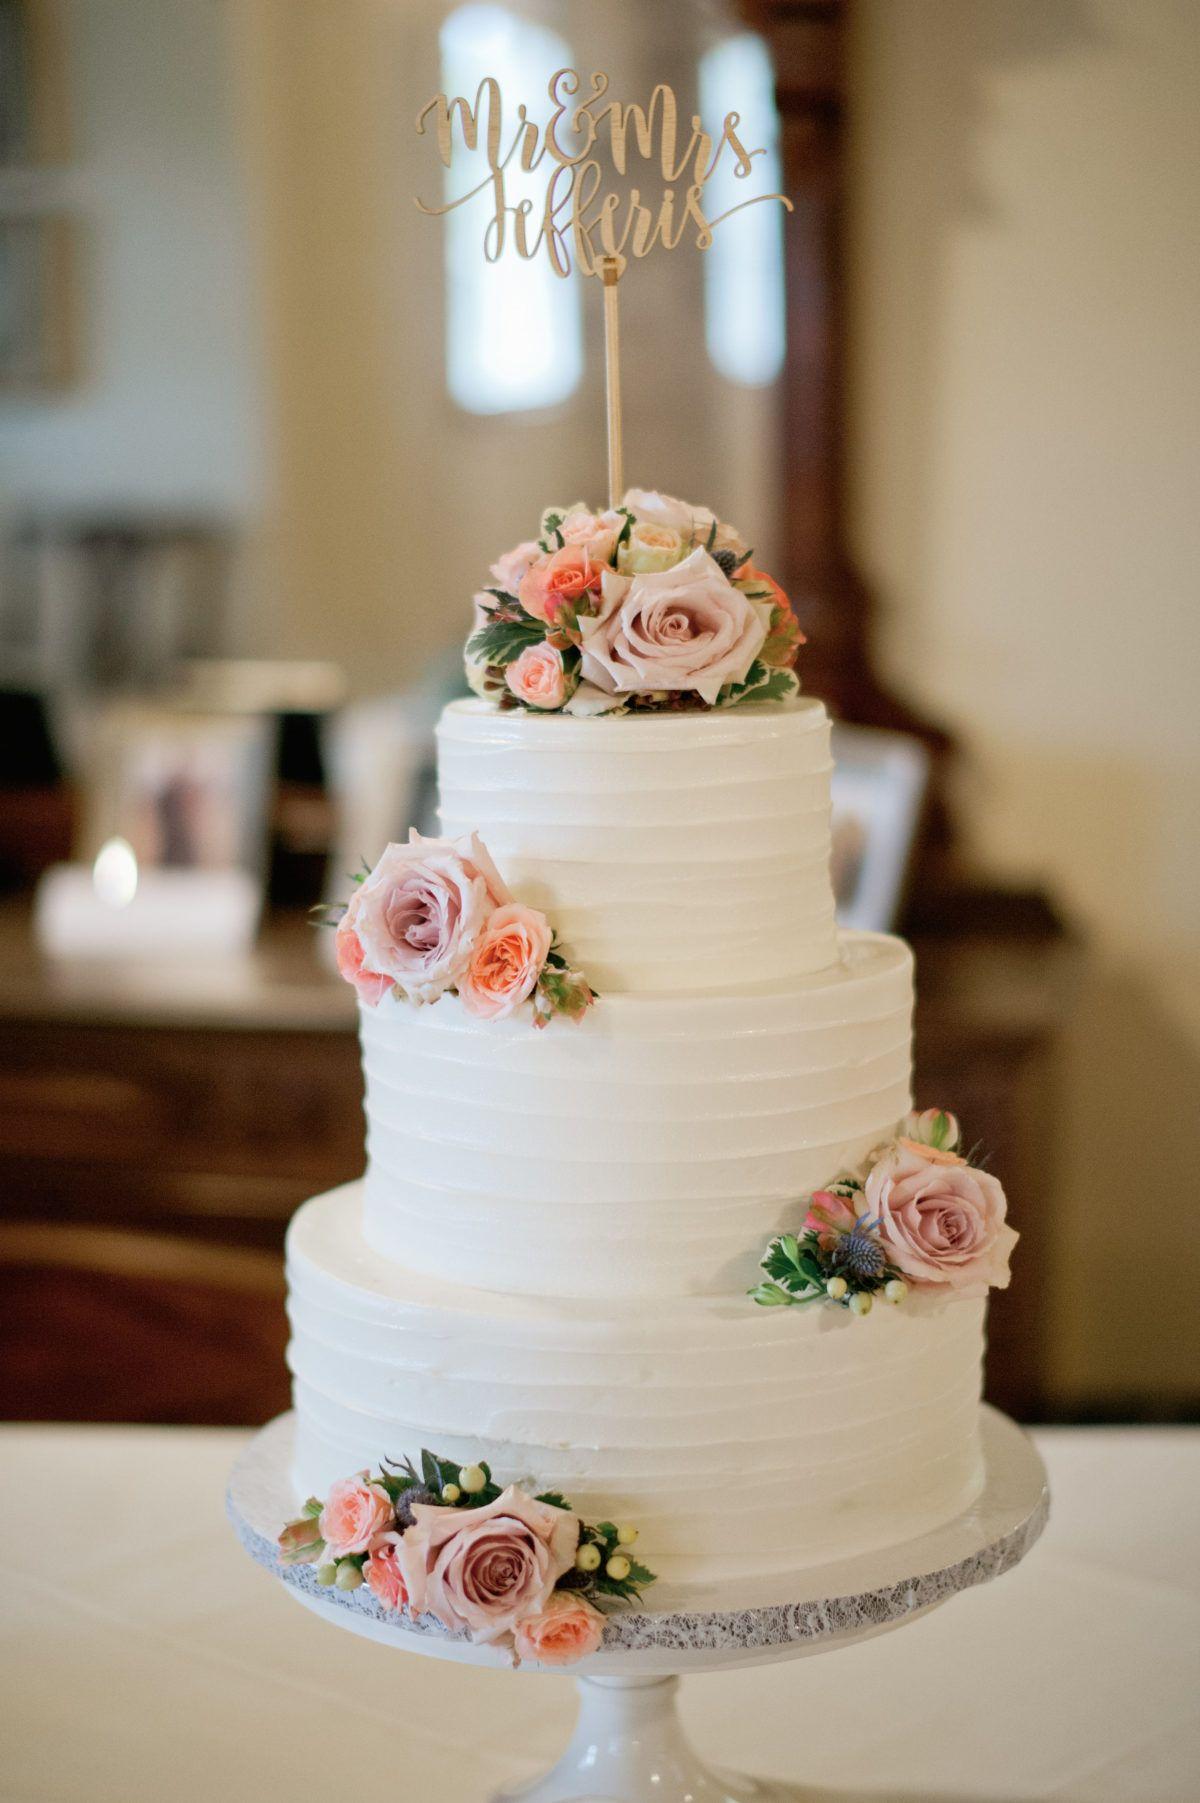 Austin wedding cakes the cake plate custom wedding